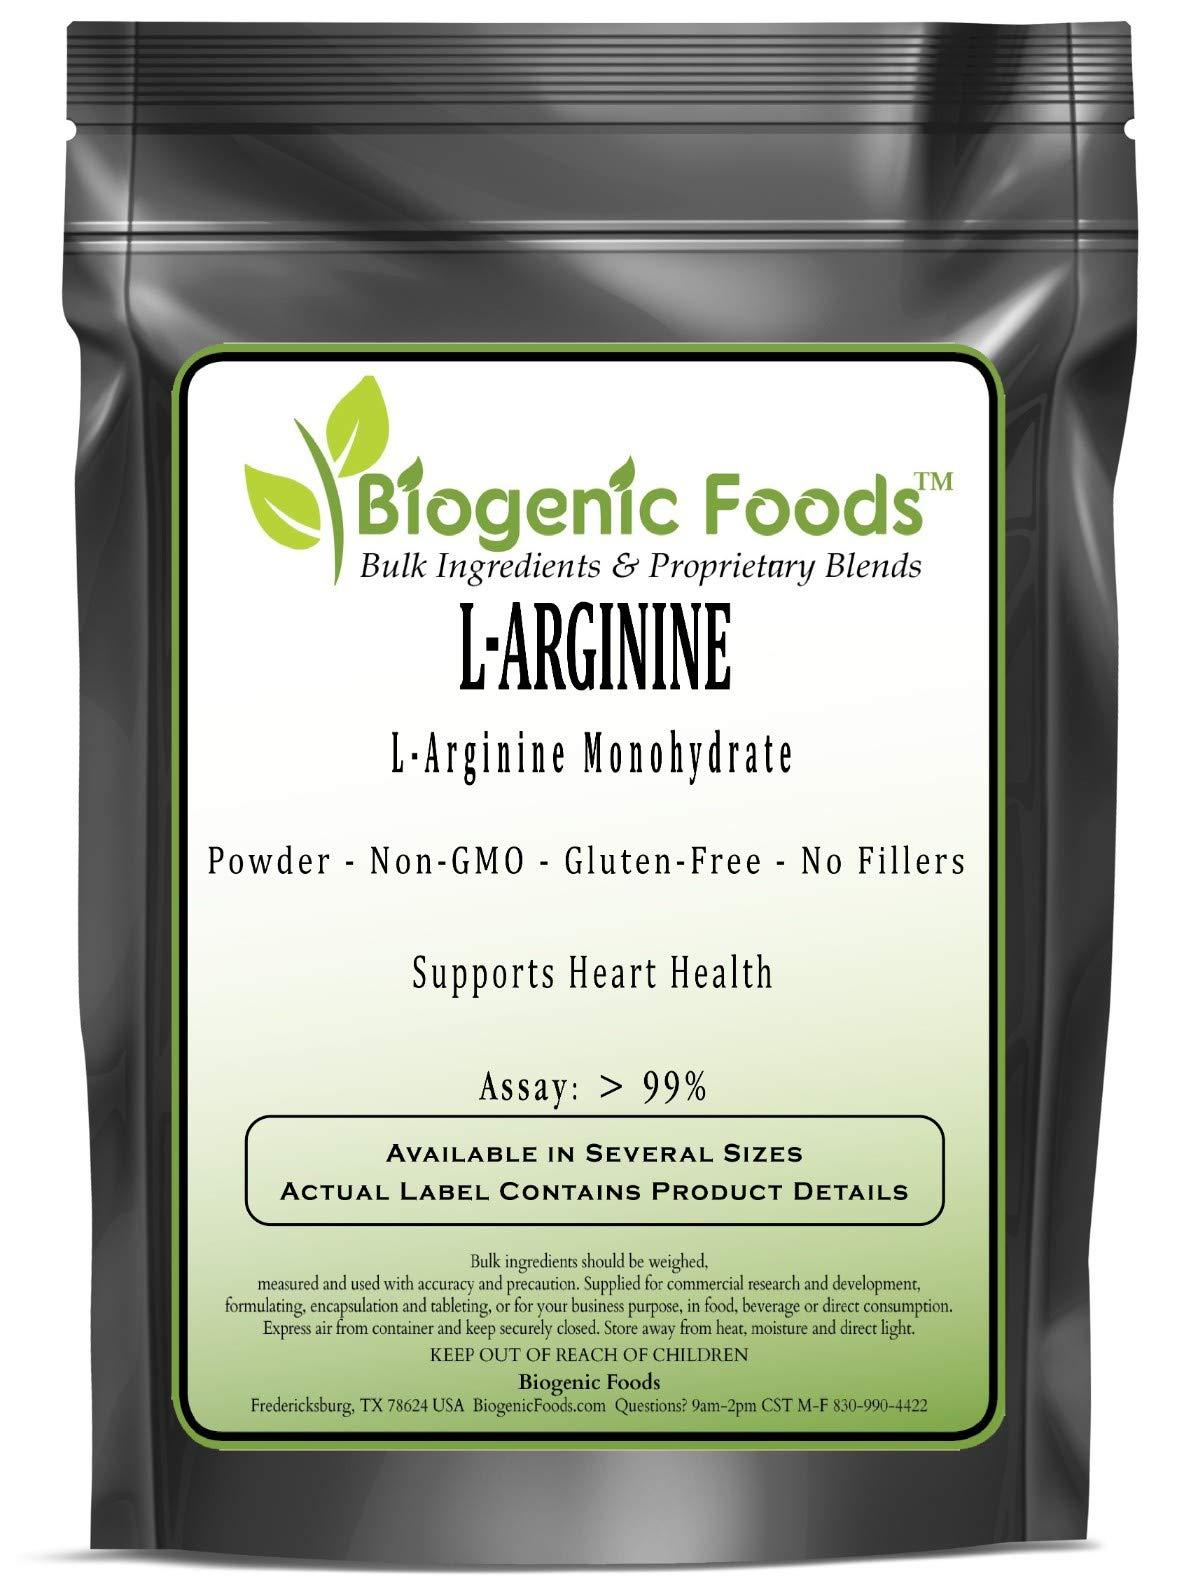 Arginine (L) - L-Arginine Monohydrate Amino Acid Powder (Assay: > 99%), 25 kg